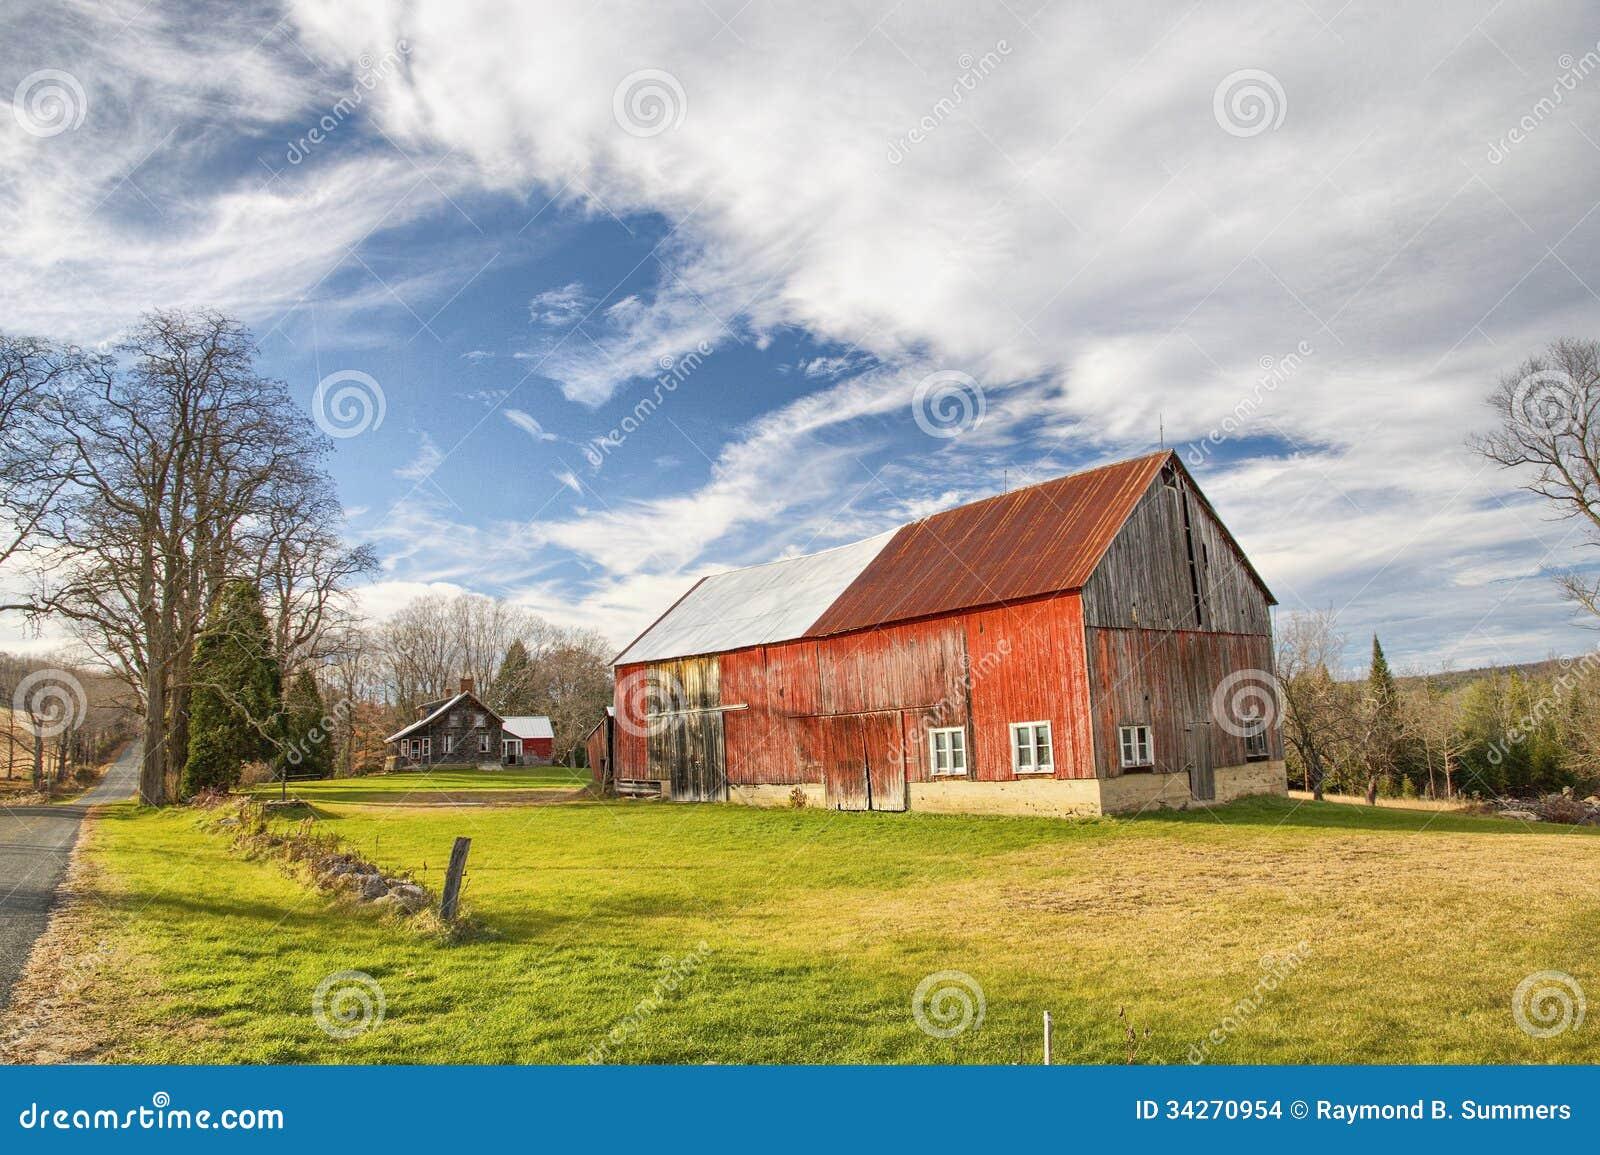 Farm Setting Stock Images Image 34270954